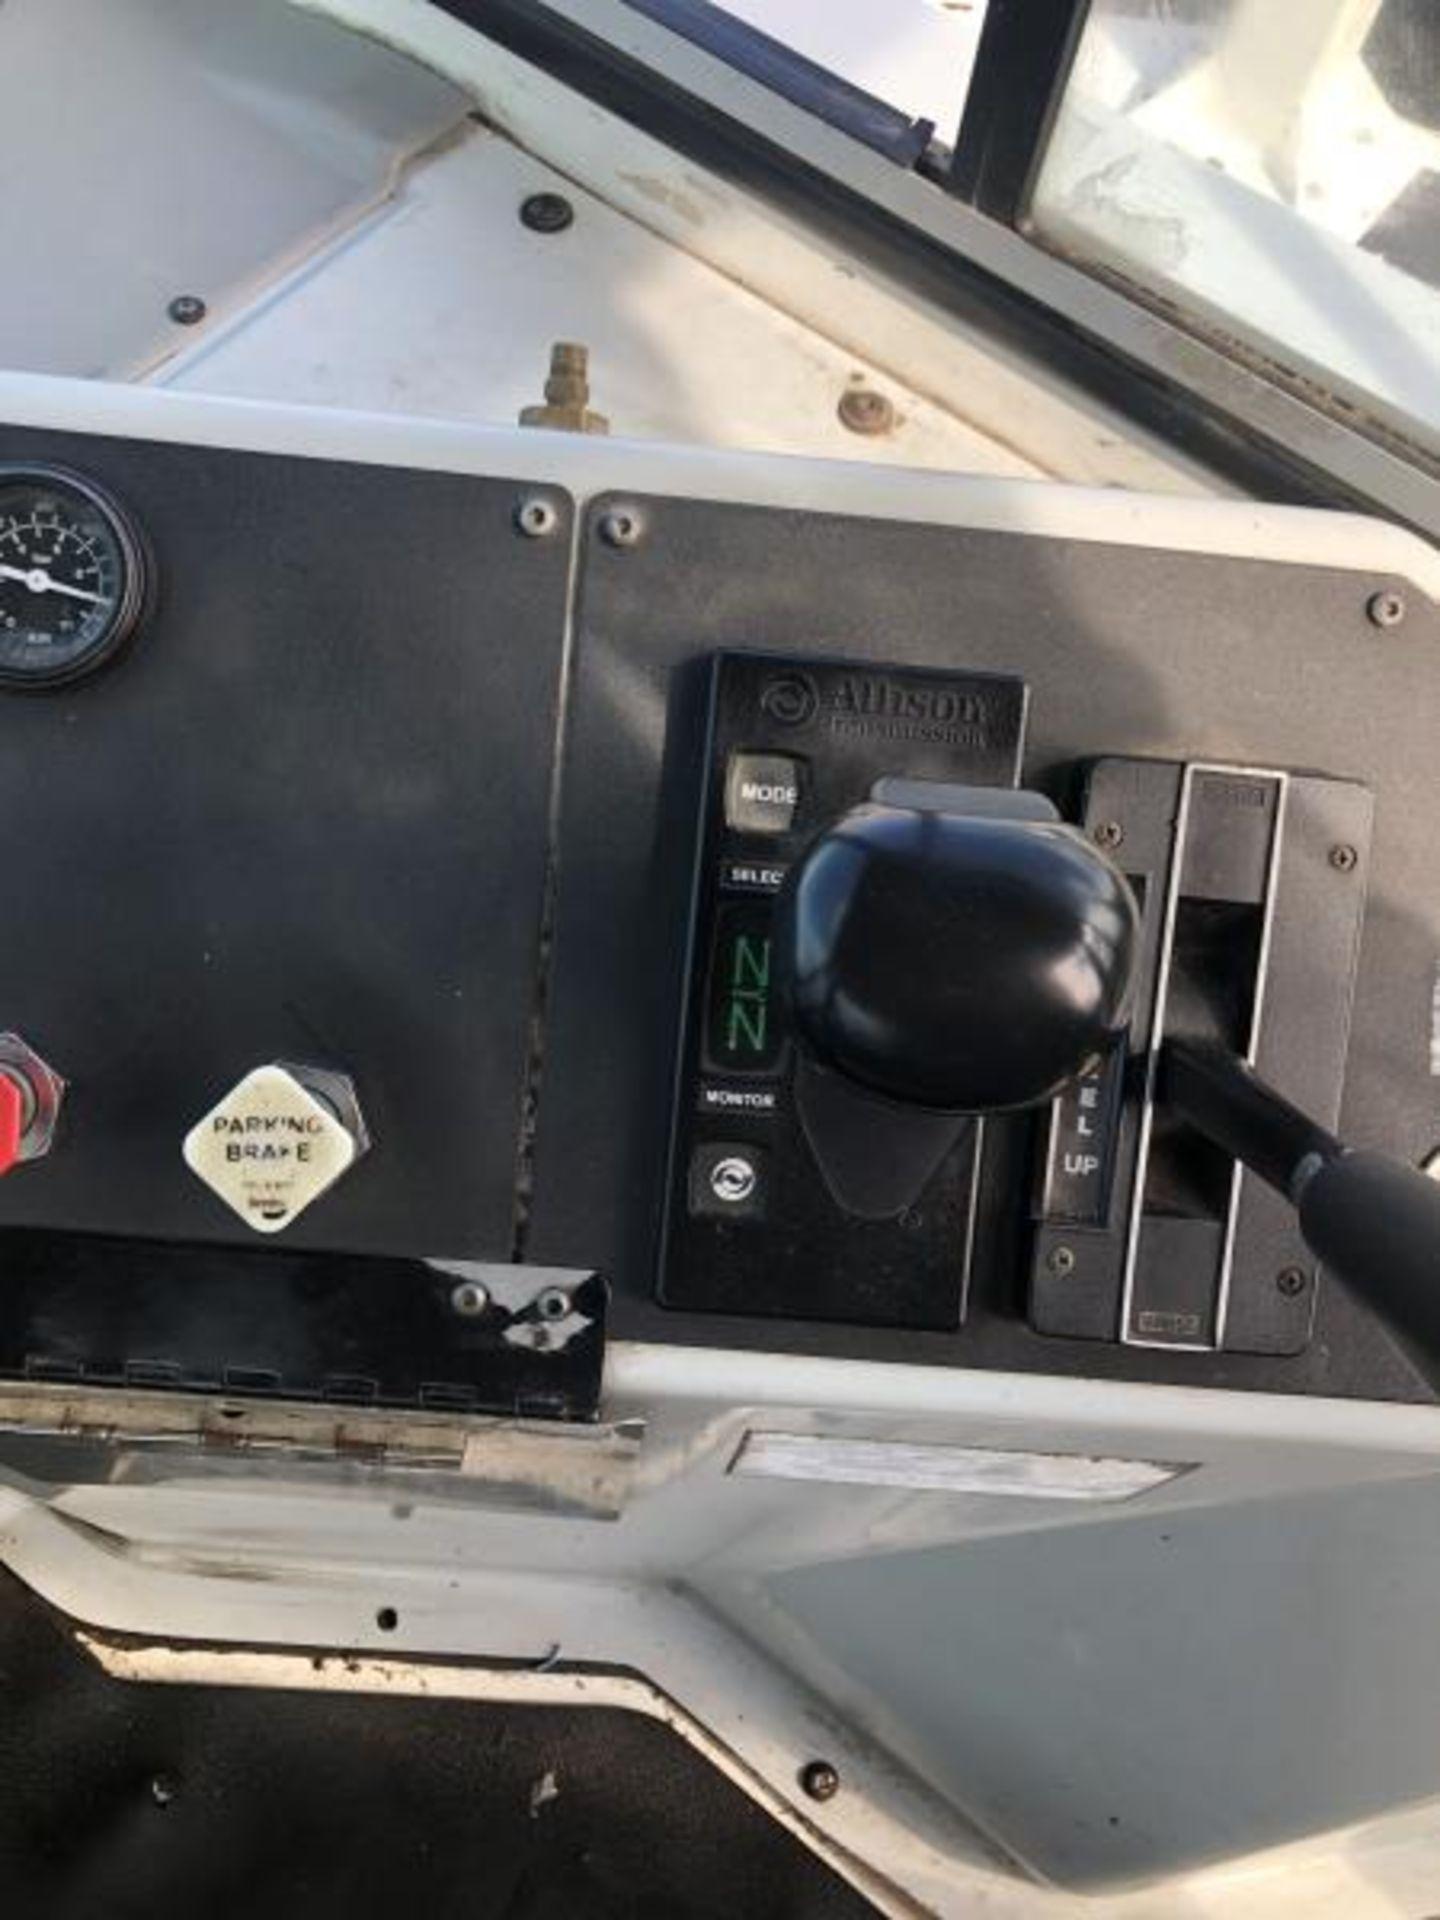 2015 Kalmar Ottawa 4x2 Yard Truck , SN: 338837 3,239.3 Hours, 3,125 Miles - Image 31 of 32